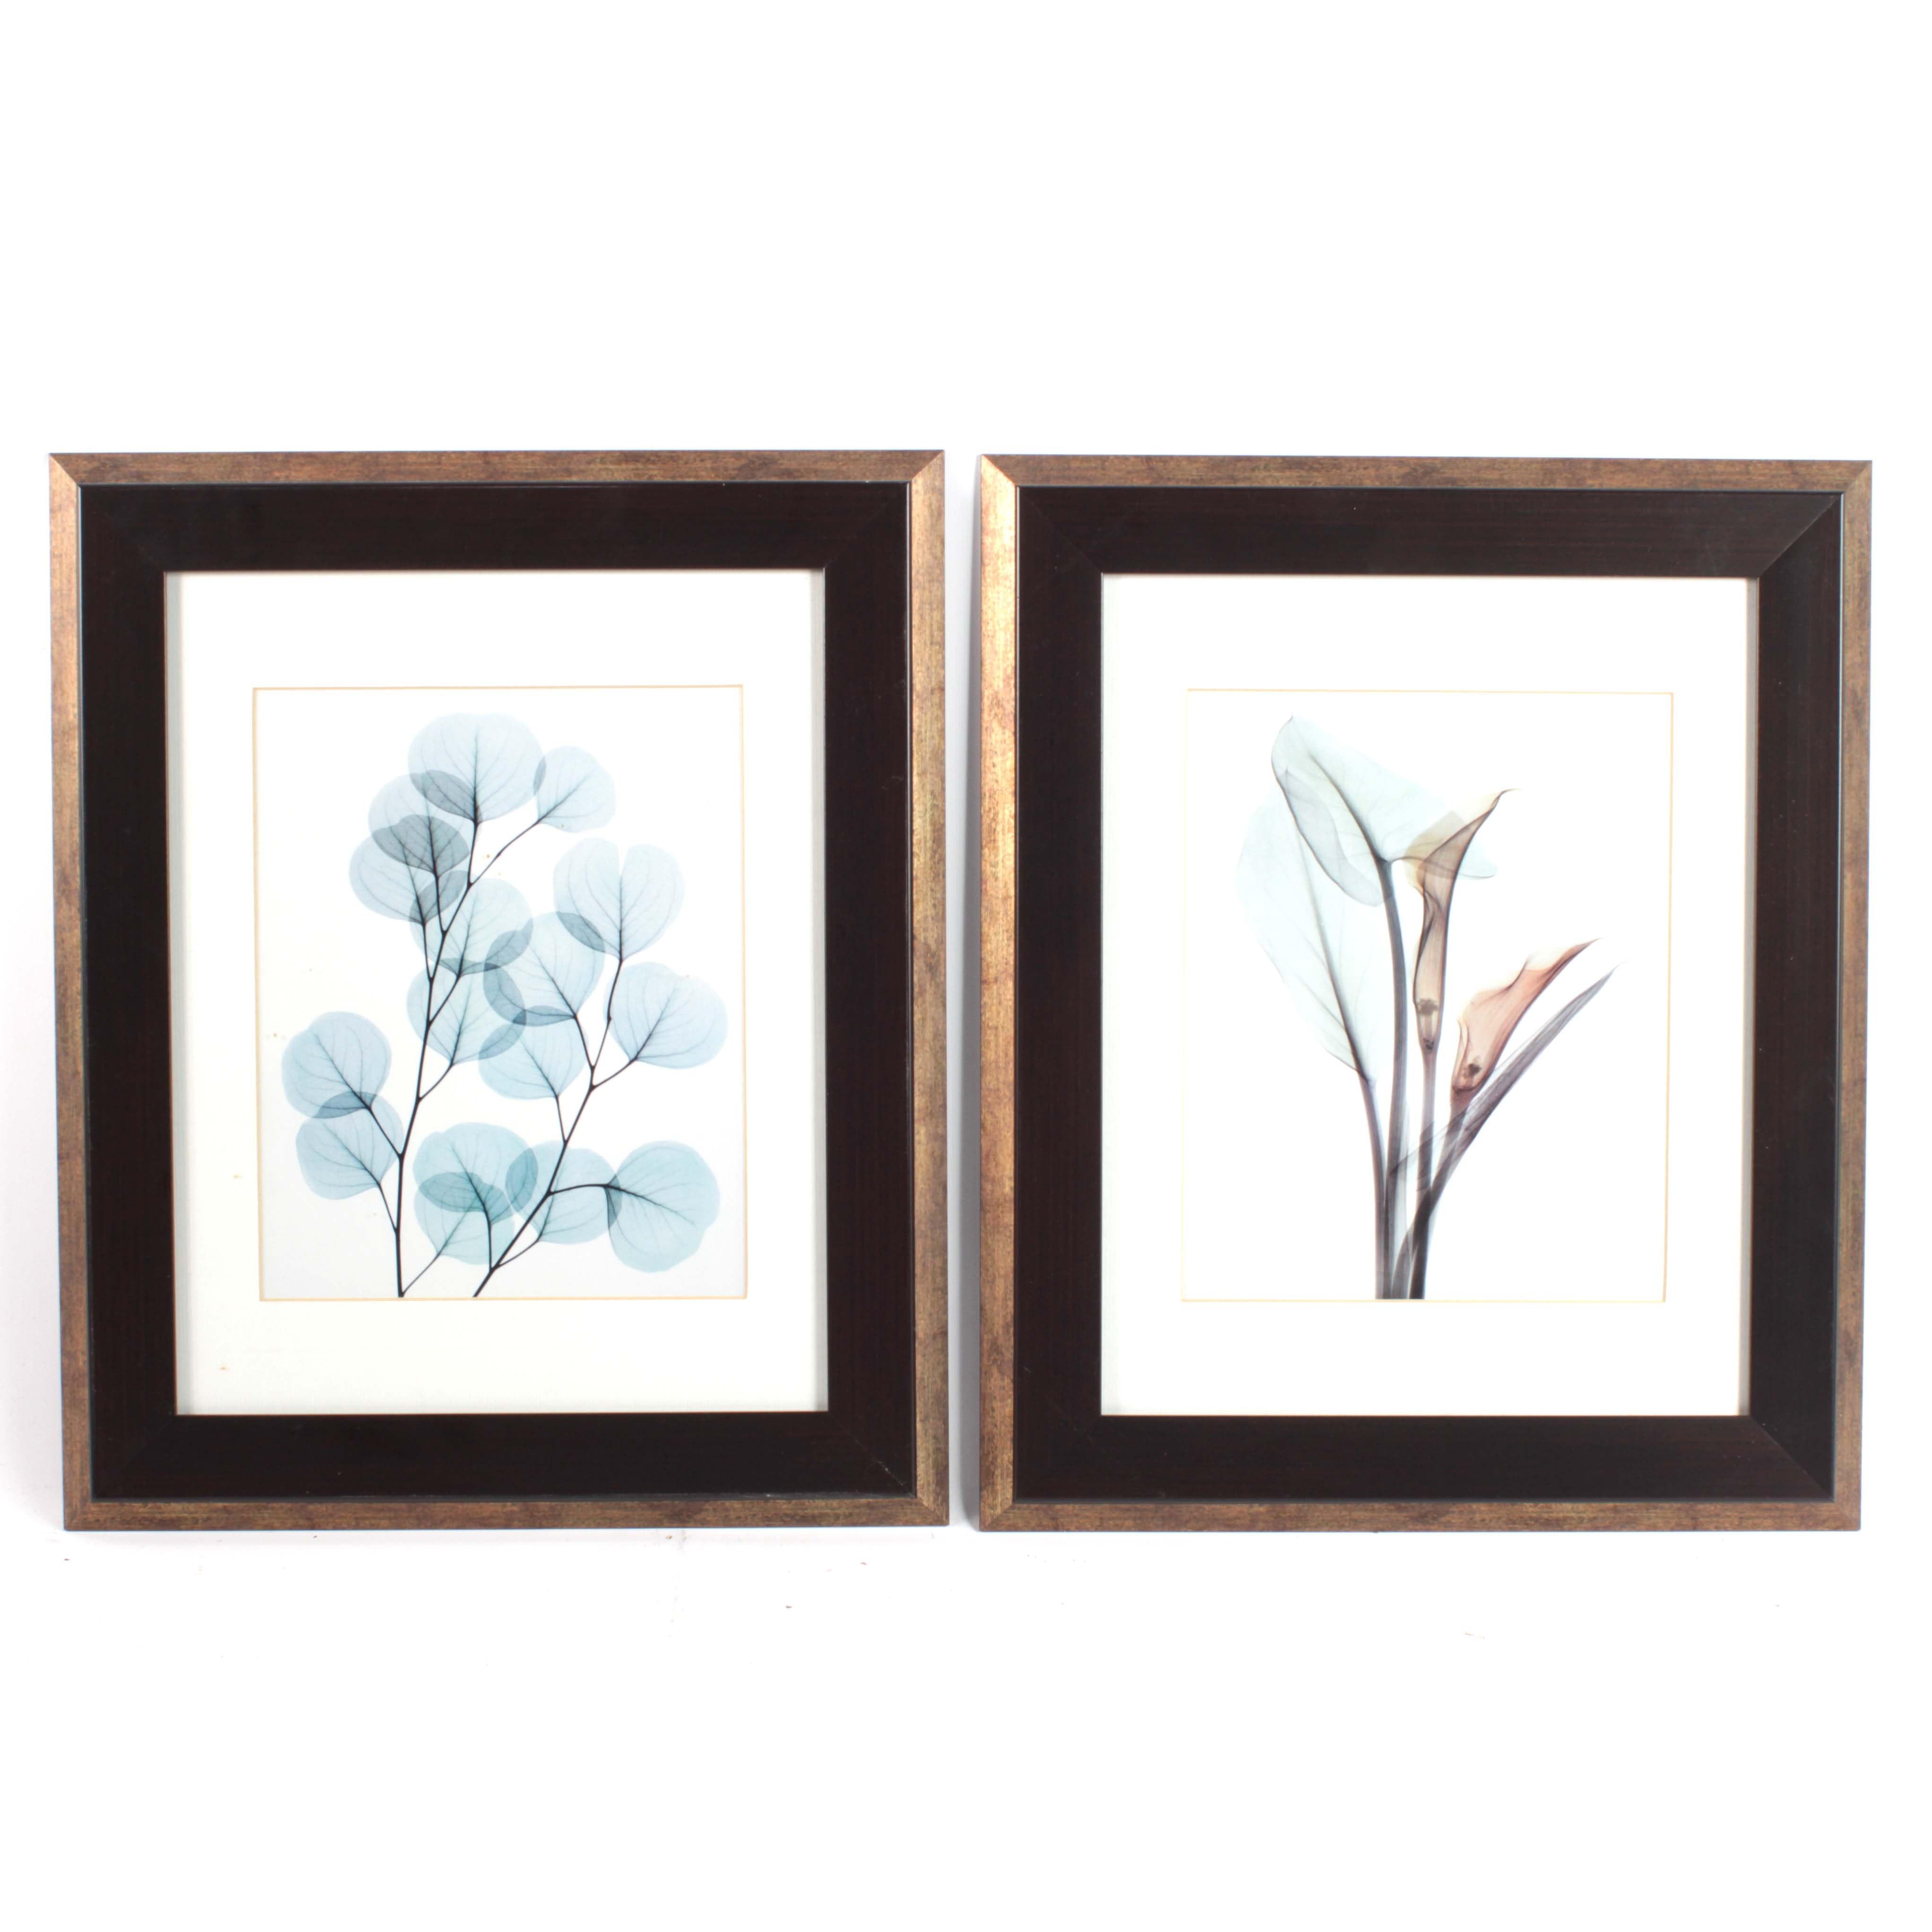 Botanical Offset Lithographs